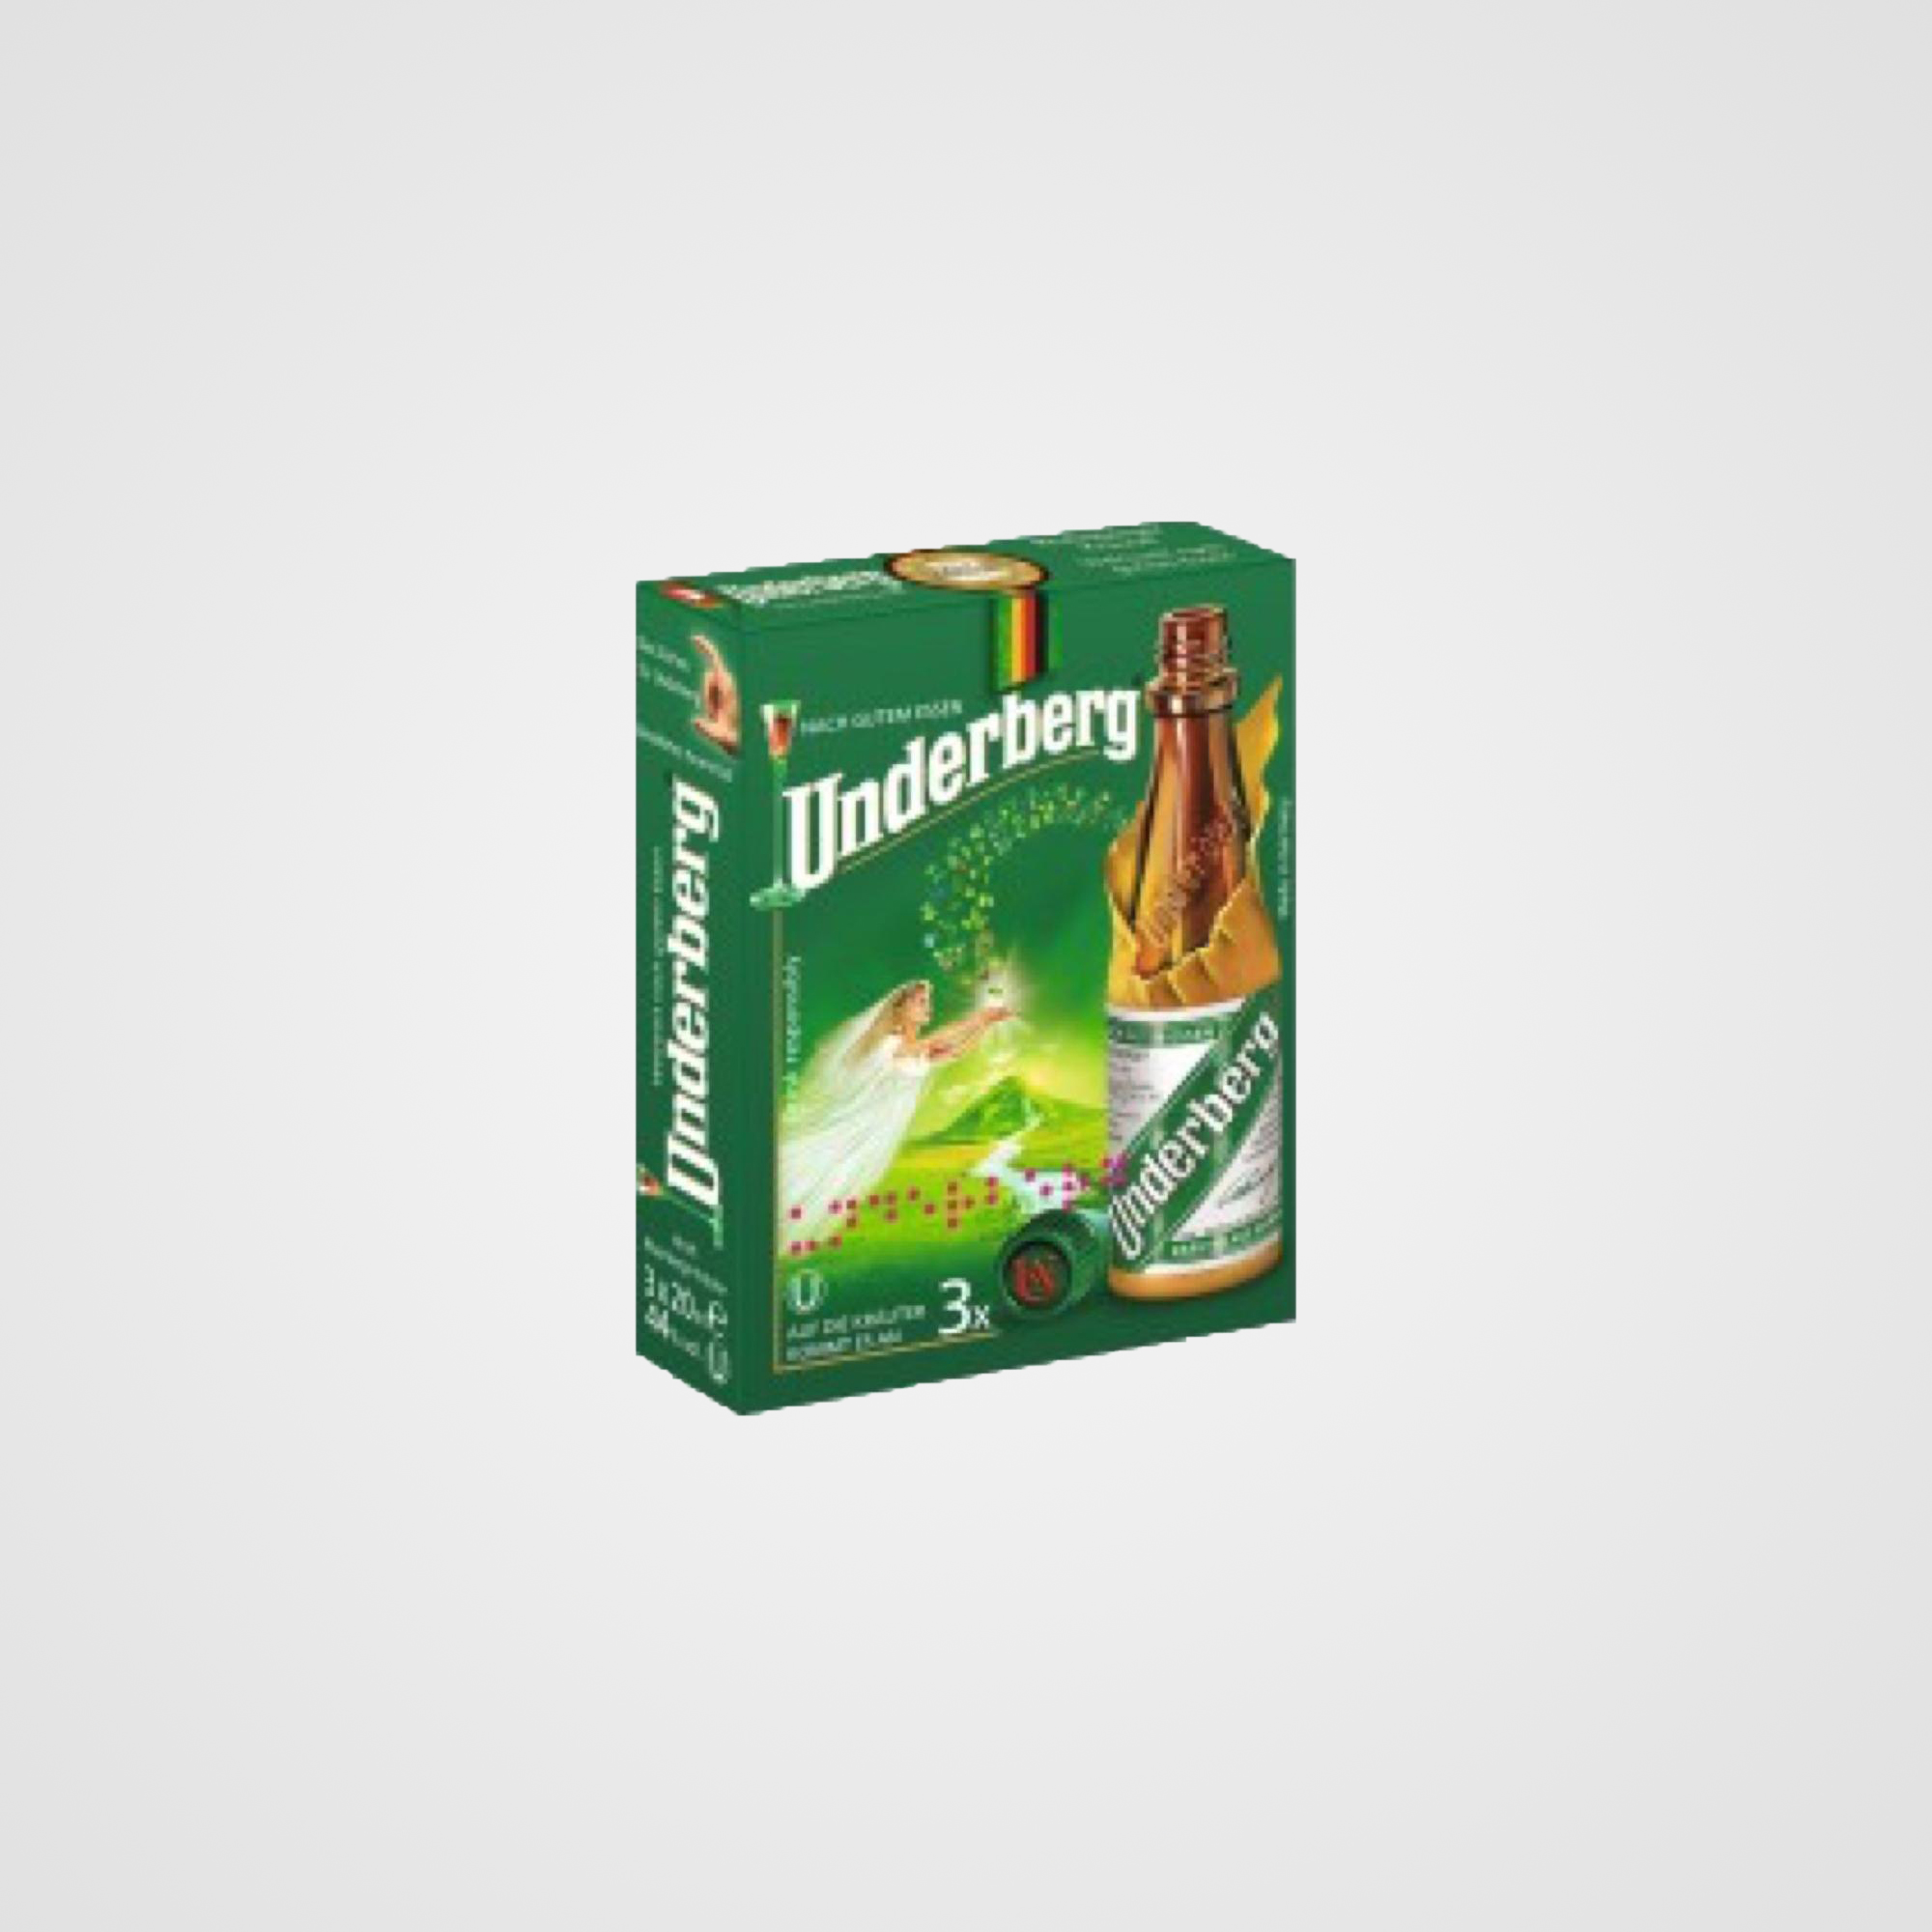 3 Bottle Pack - Underberg 3-Bottle Pack contains 3 portion size bottles of Underberg.Each Bottle is 20 ml. / 67 fl oz.Net Weight: 60 ml. / 2.01 fl oz.Country of Origin: Germany